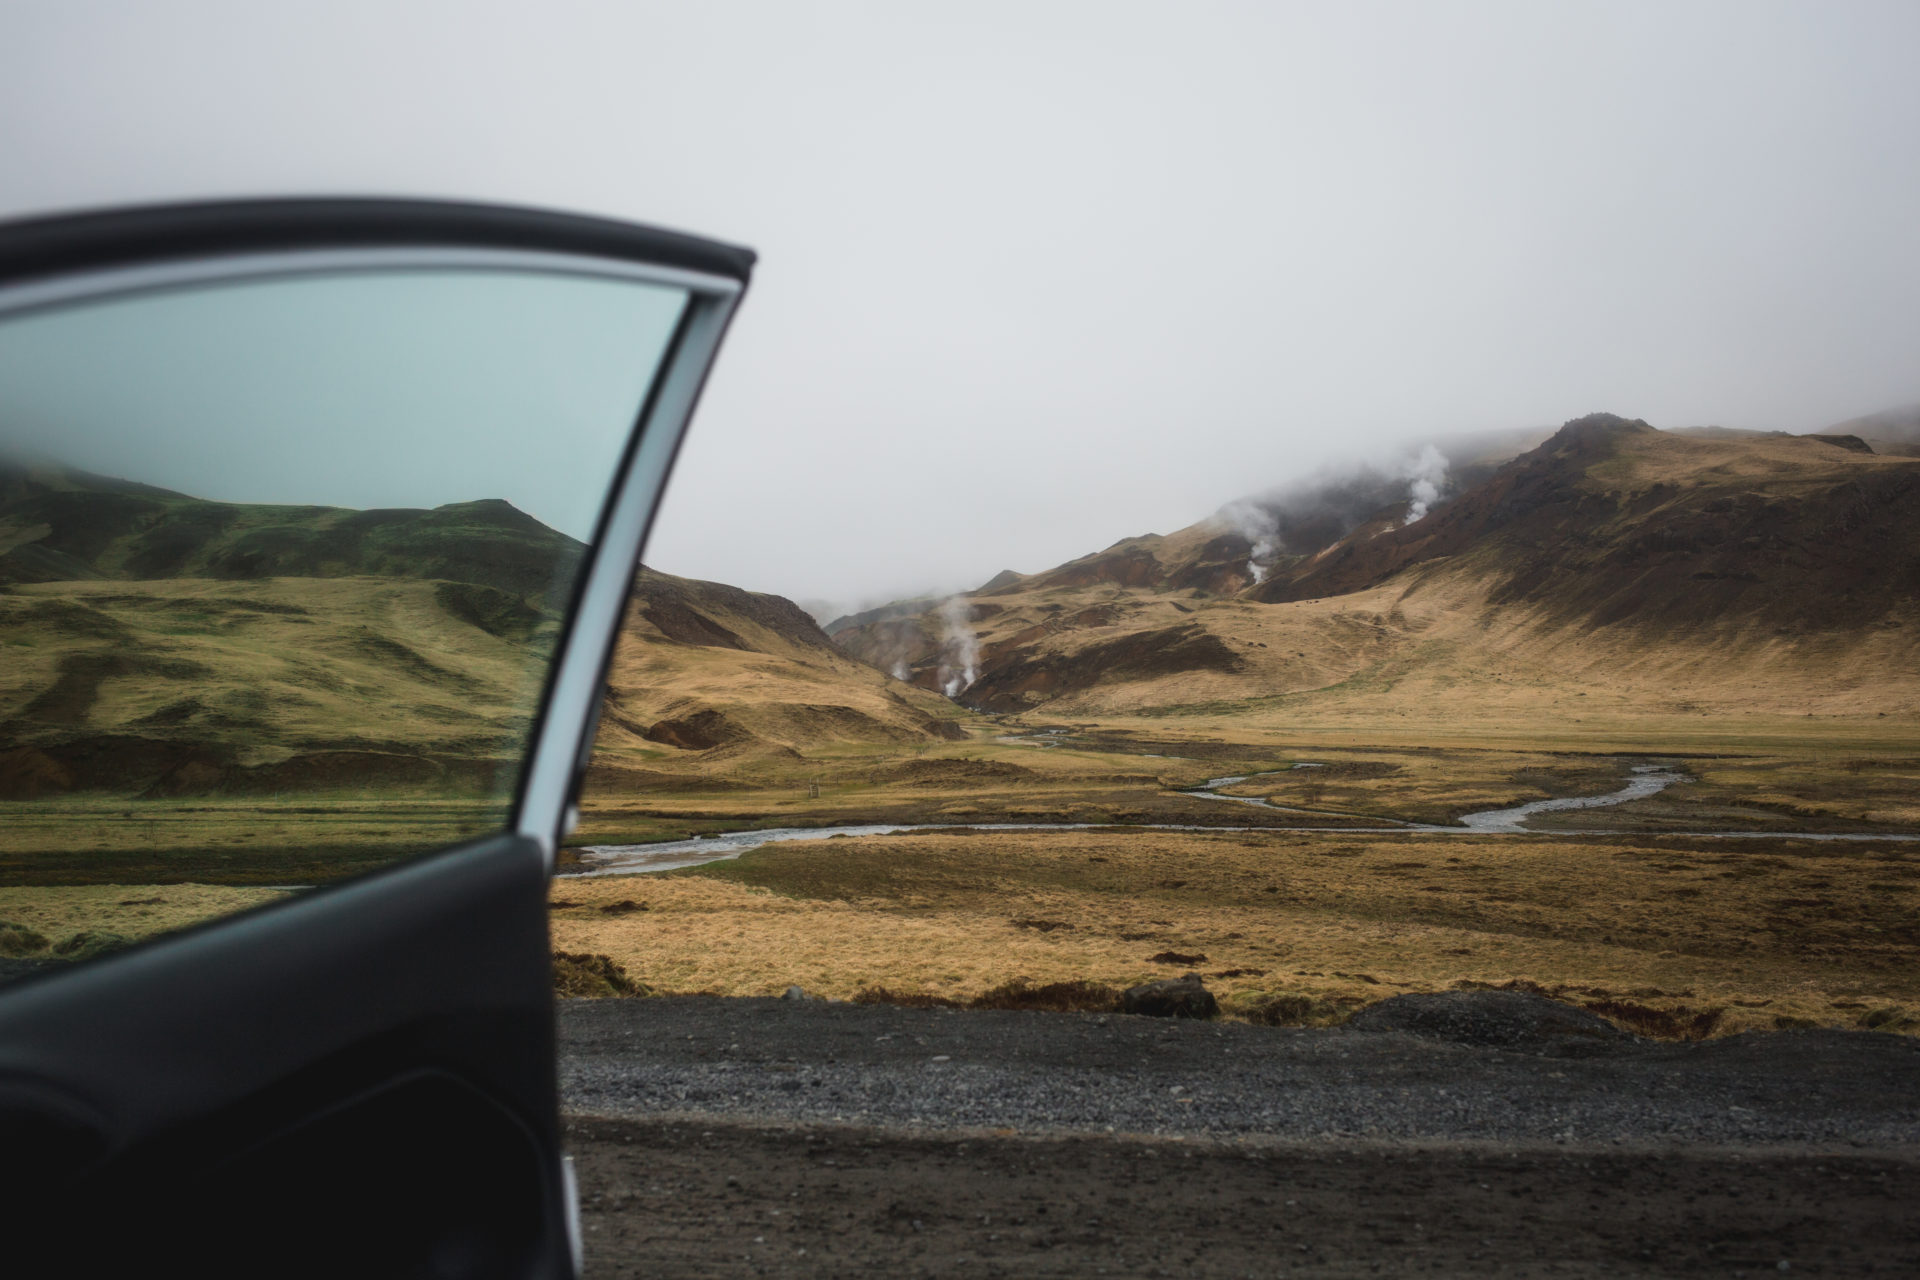 Island_Iceland_IMG_1168_Carolin-Weinkopf